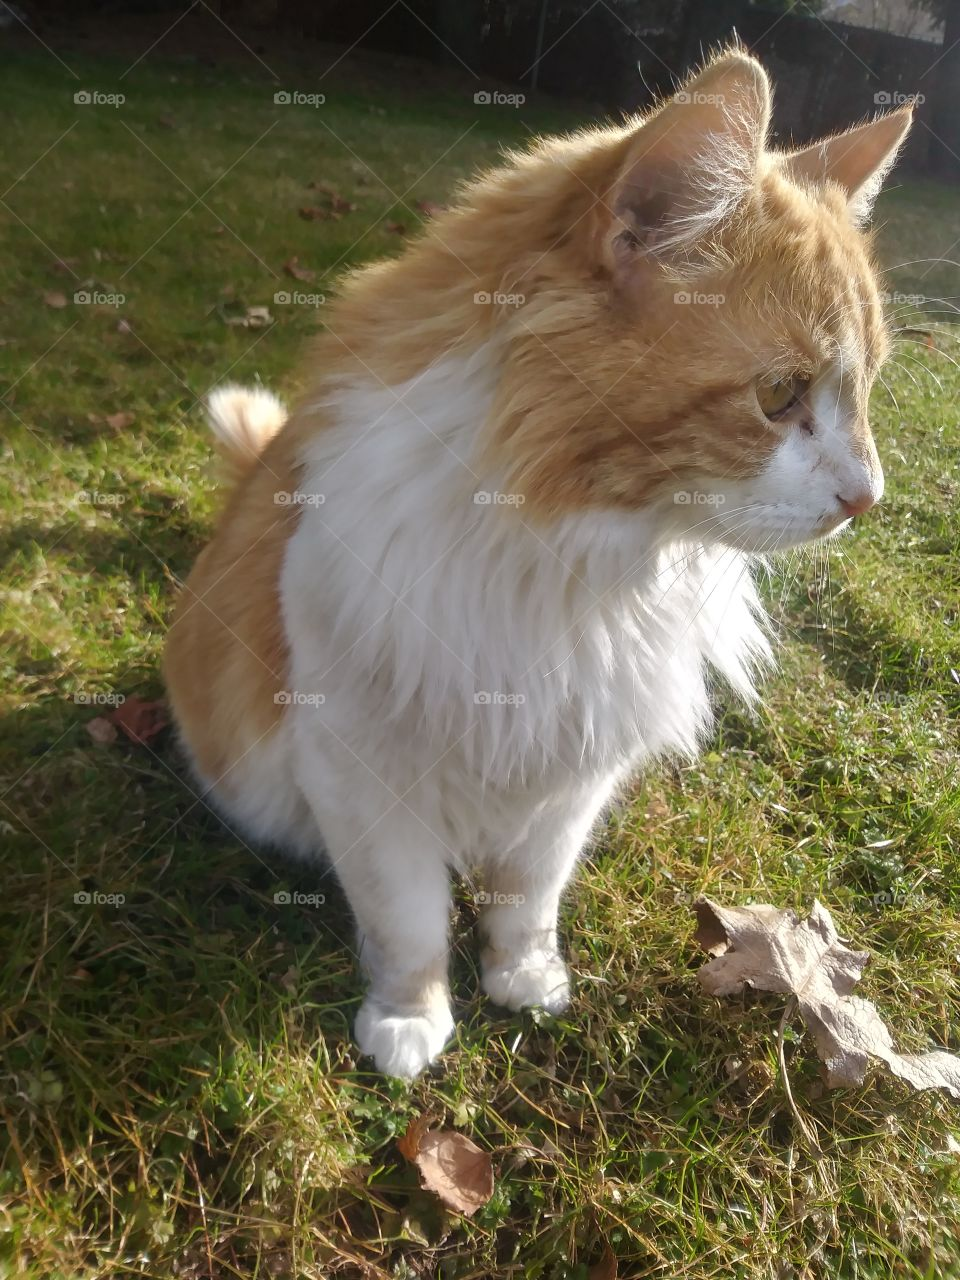 An orange and white cat named Natsu, enjoying the sunny day 🌞